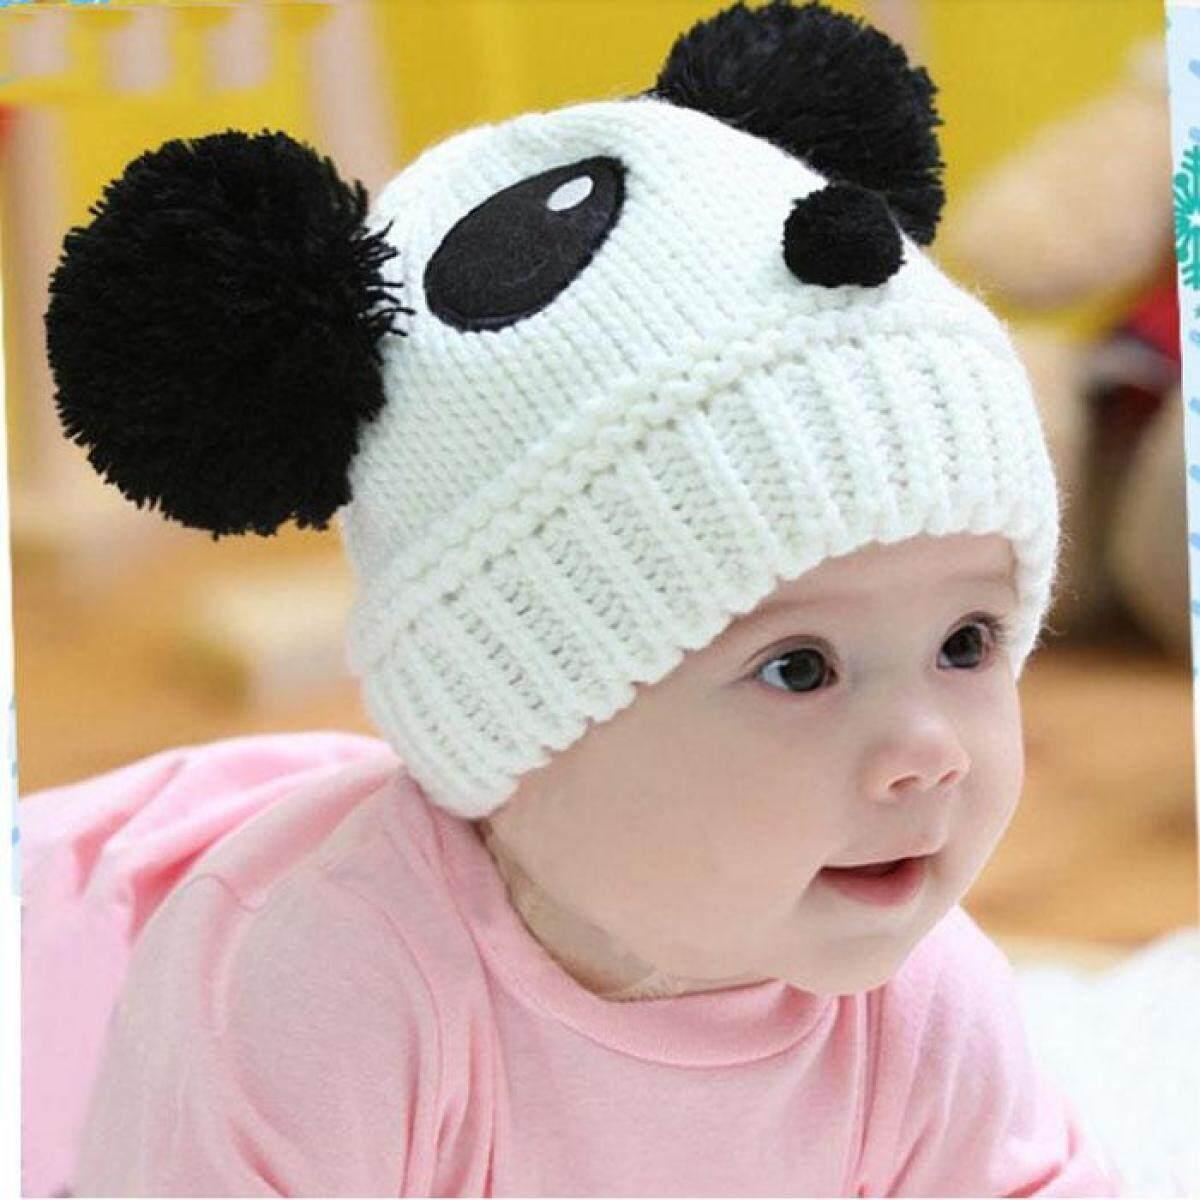 Lucu Anak Bayi Perempuan Anak Laki-laki Elastis Hangat Musim Dingin Panda Topi  Topi Beanie 978675c053